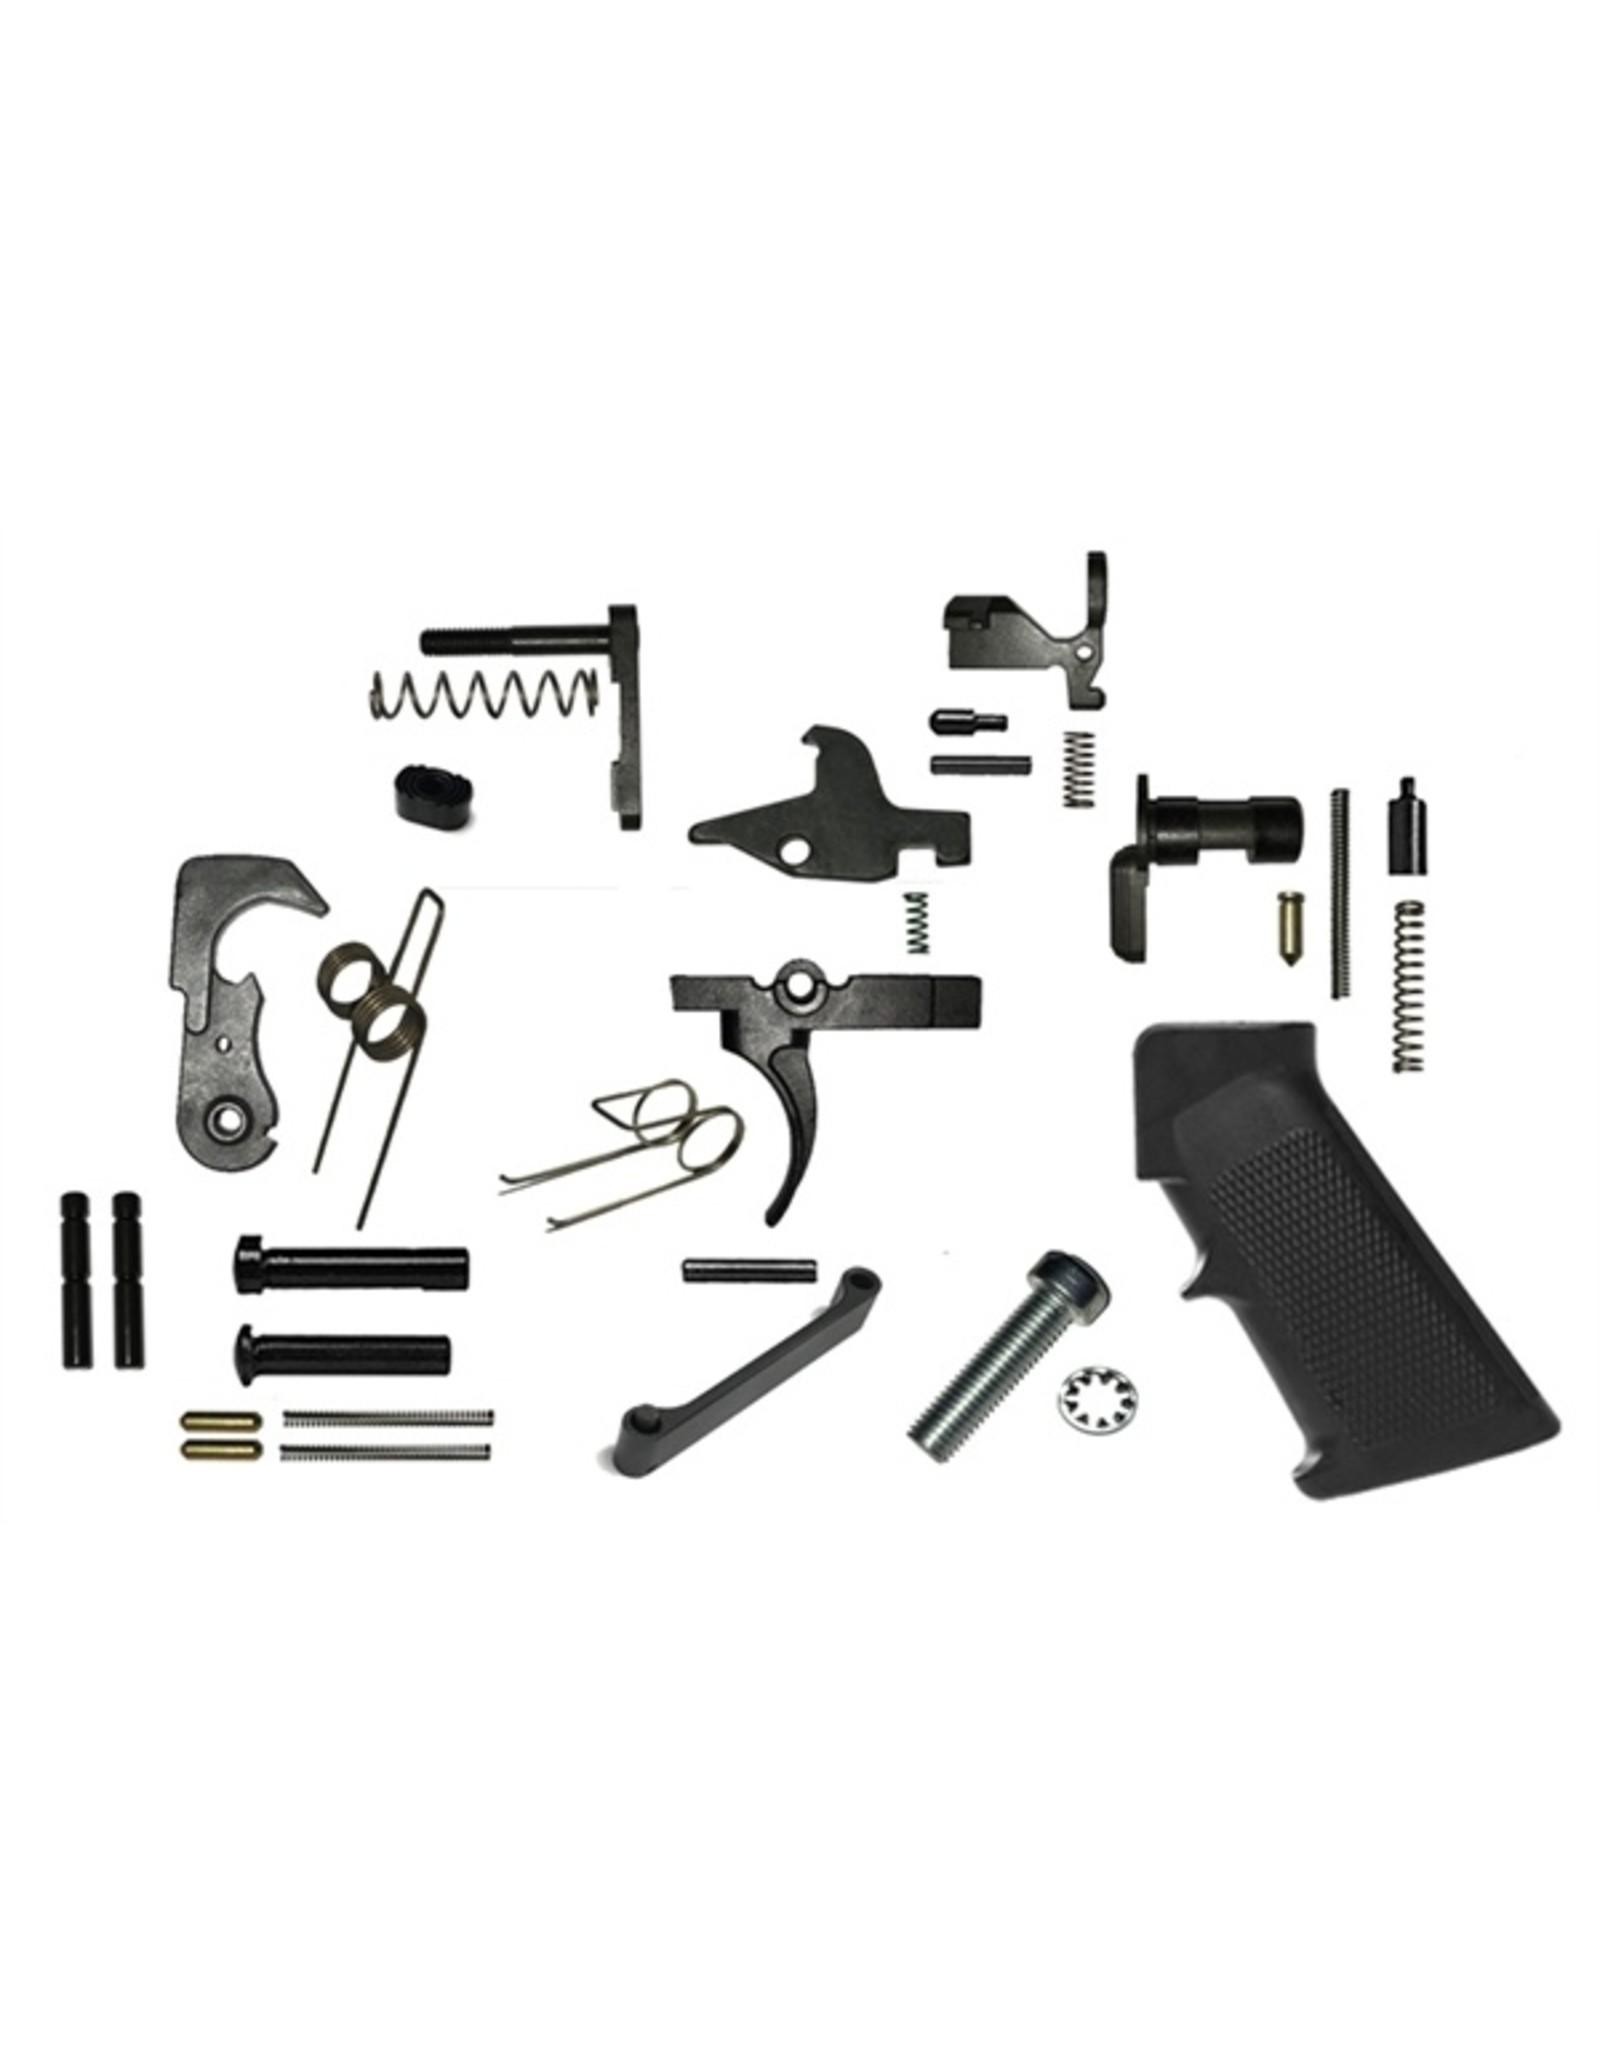 AR-15 Lower Parts Kit